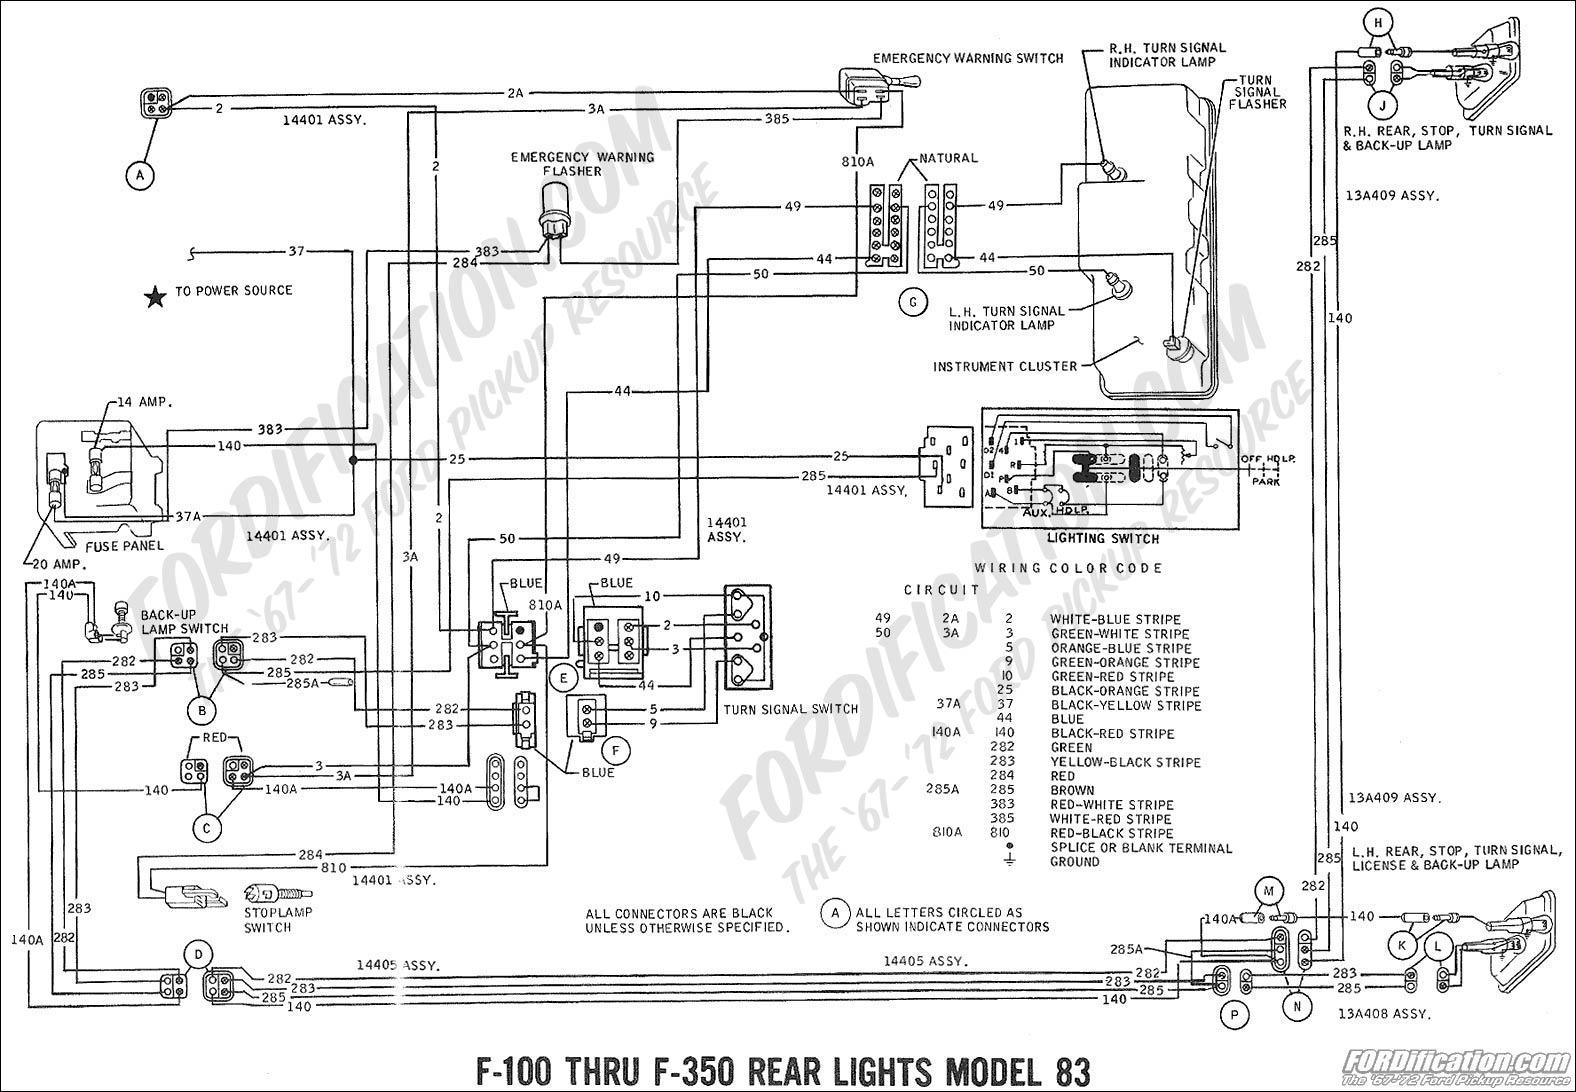 [DIAGRAM_38IU]  AE_0683] 1977 Ford Pinto Wiring Diagram Schematic Wiring | Ford Pinto Wiring Diagram |  | Gue45 Xlexi Abole Phan Gious Sequ Diog Ginou Pelap Elec Mohammedshrine  Librar Wiring 101